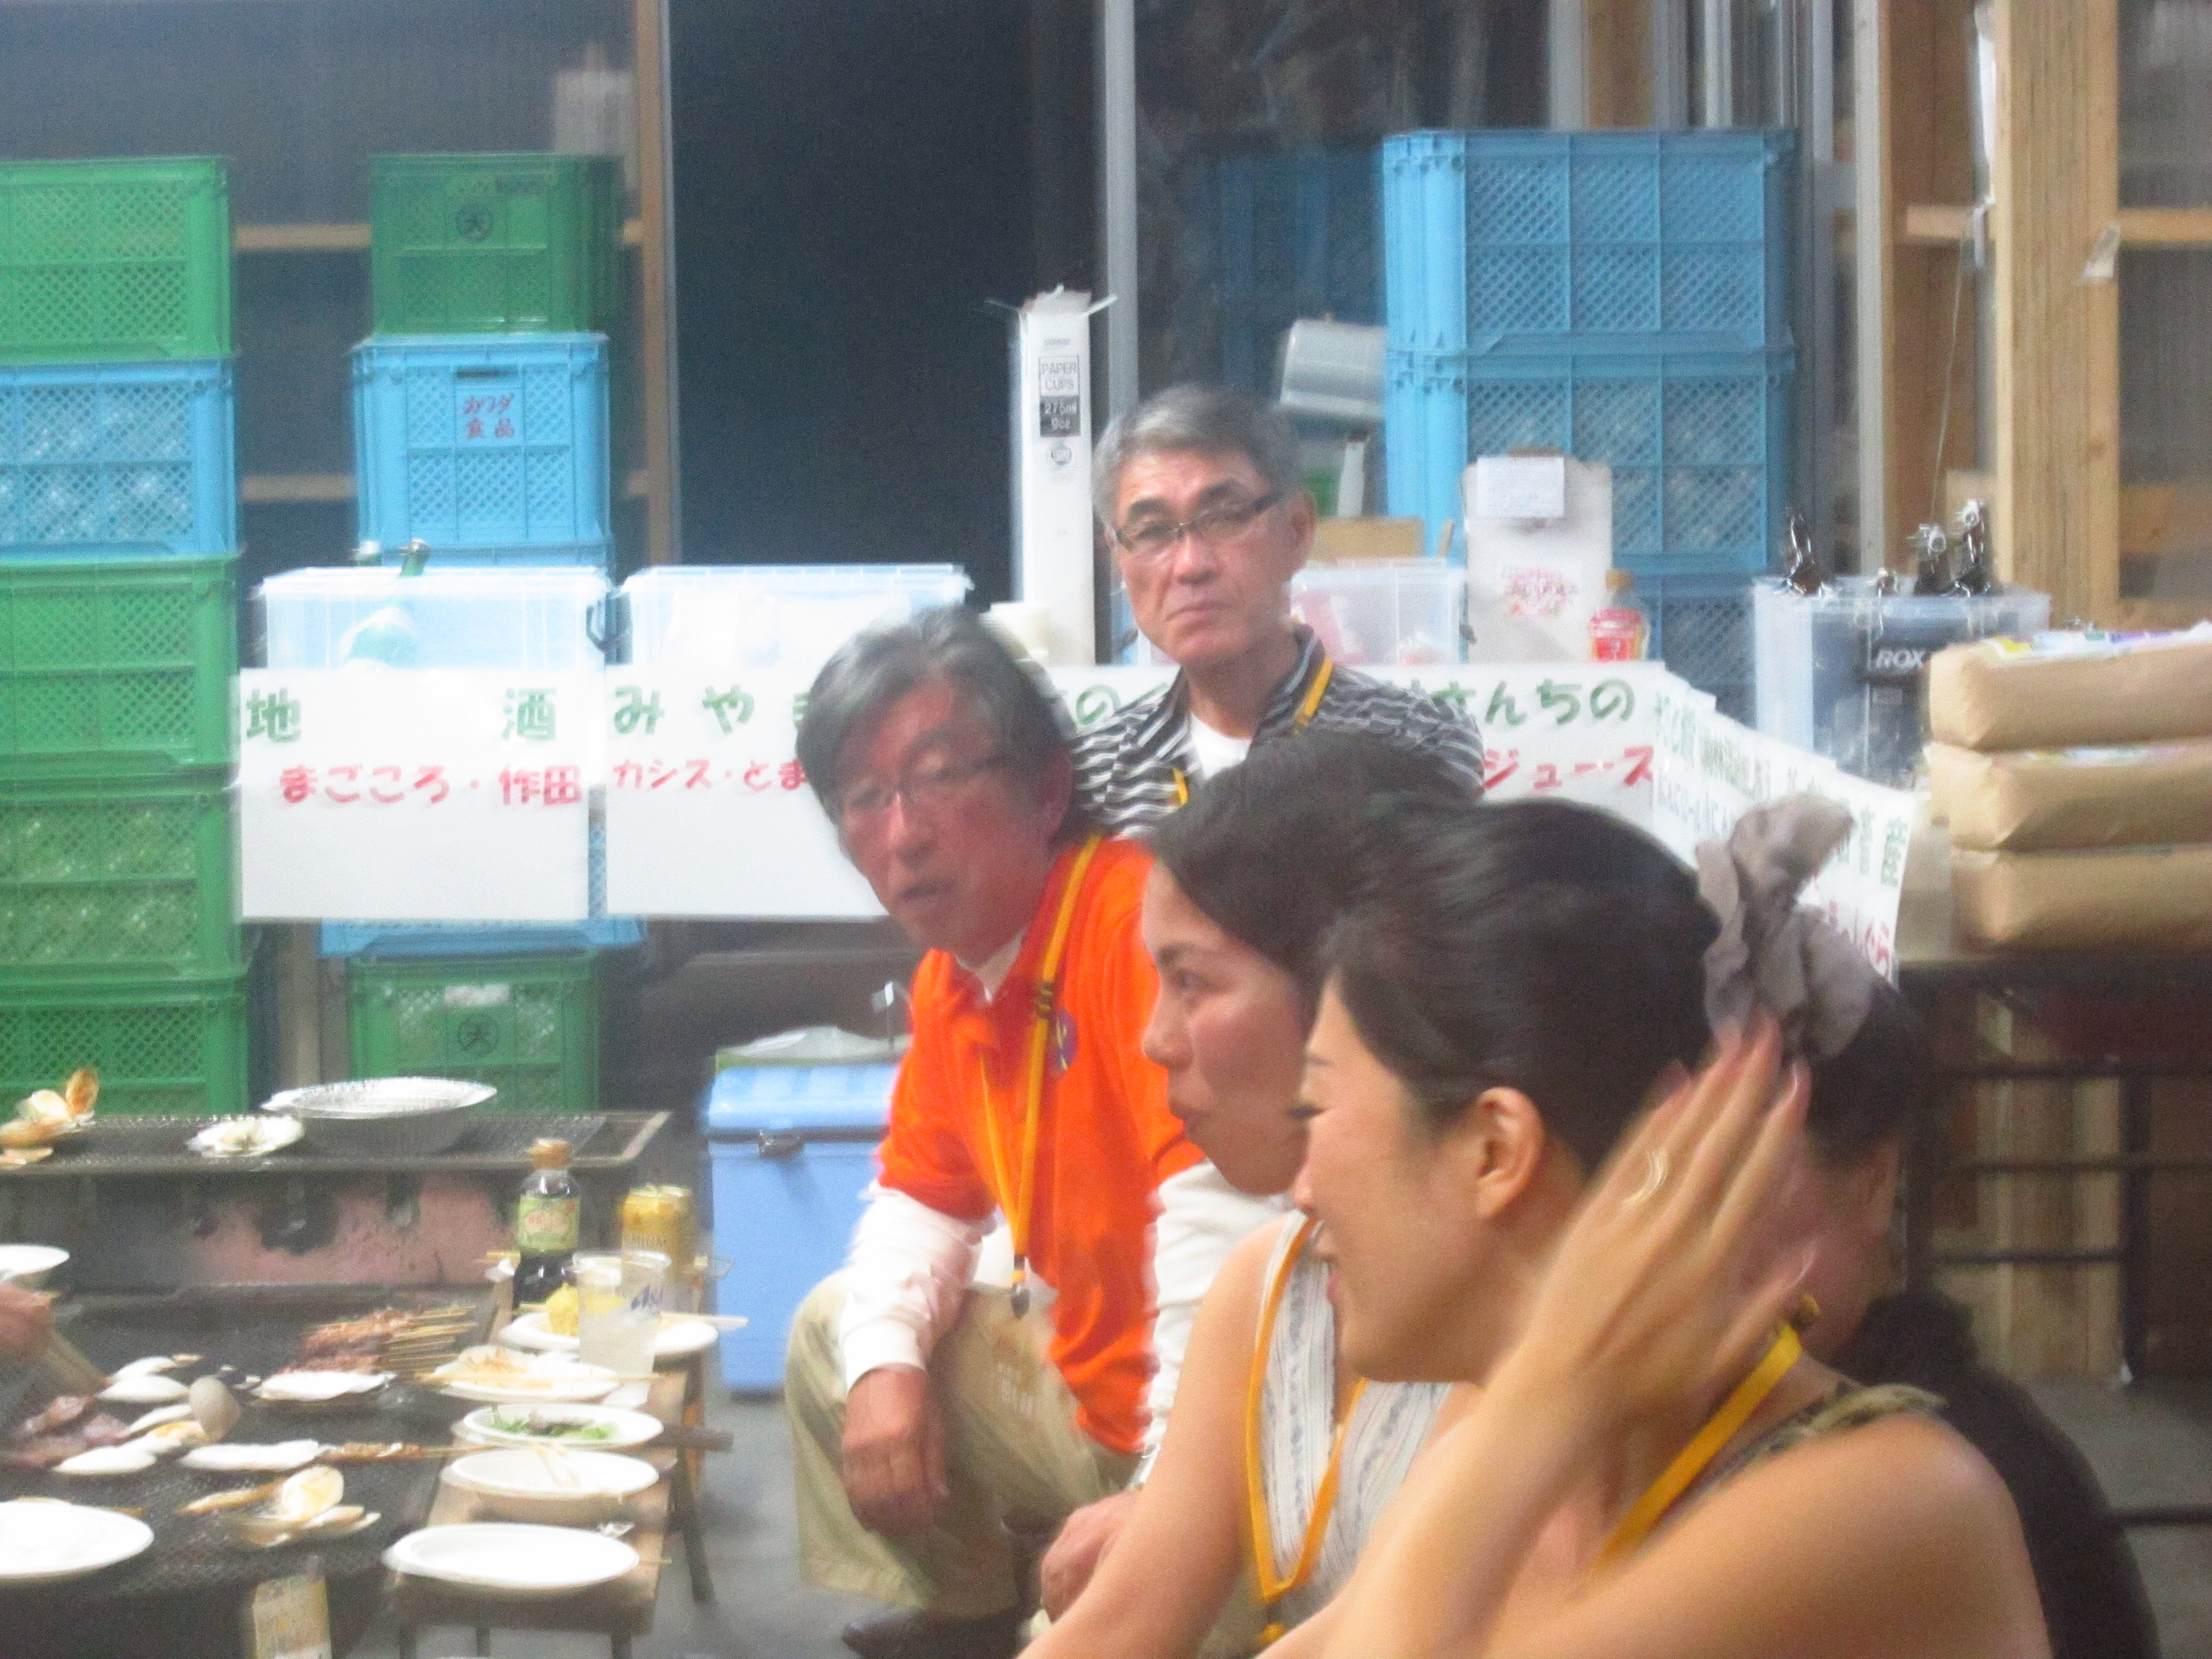 IMG 4352 - 麻布十番納涼祭り25,26日(七戸町出店)